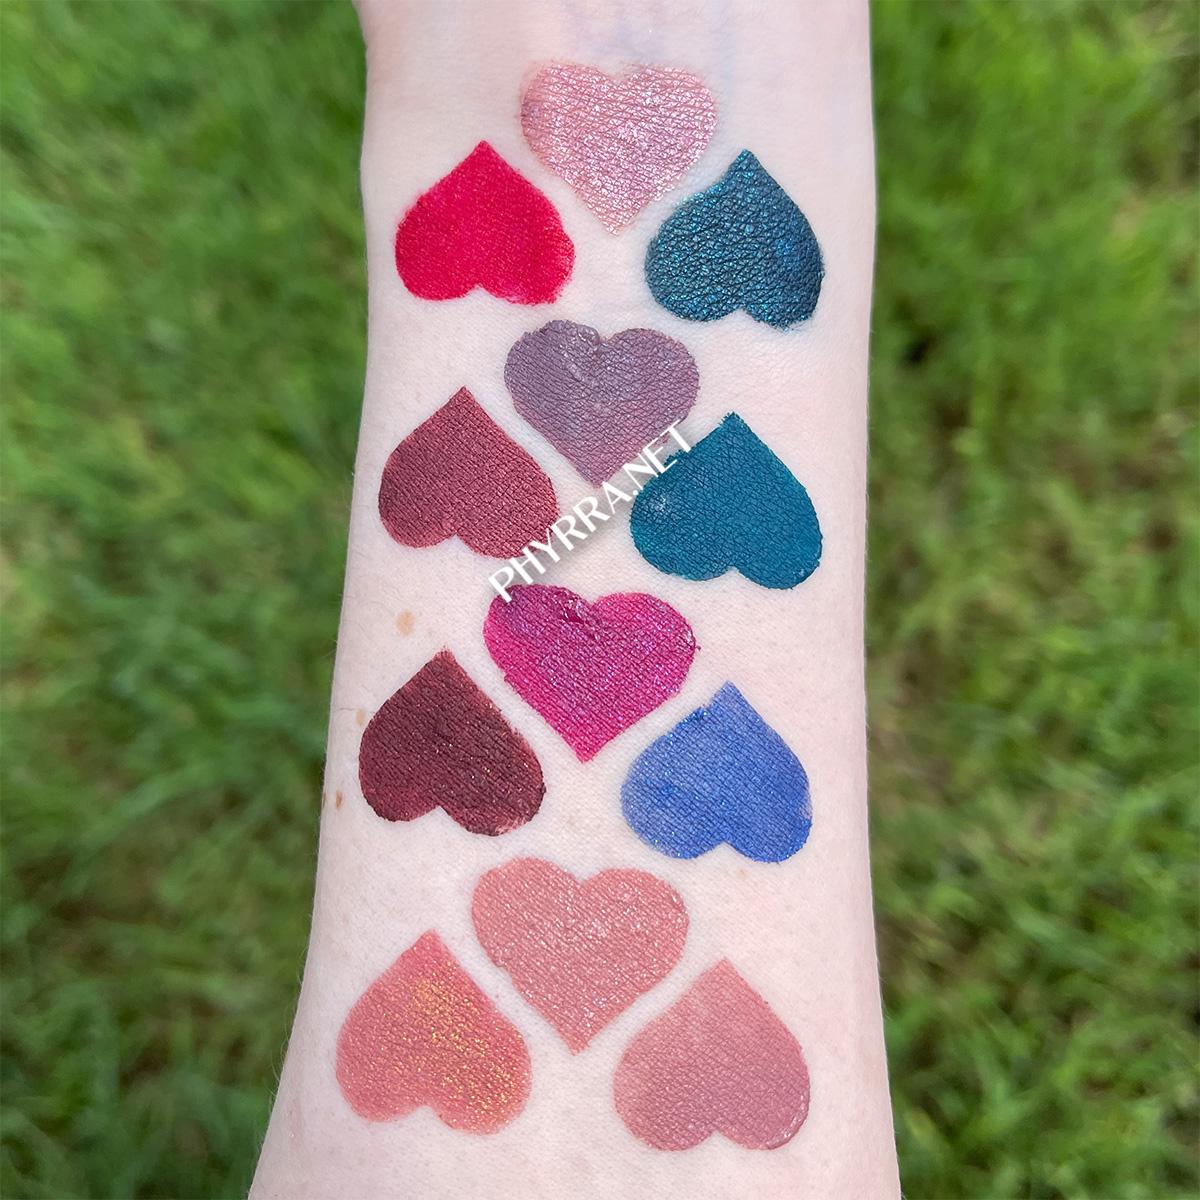 Fair Skin Sugarpill Liquid Lip Color Swatches